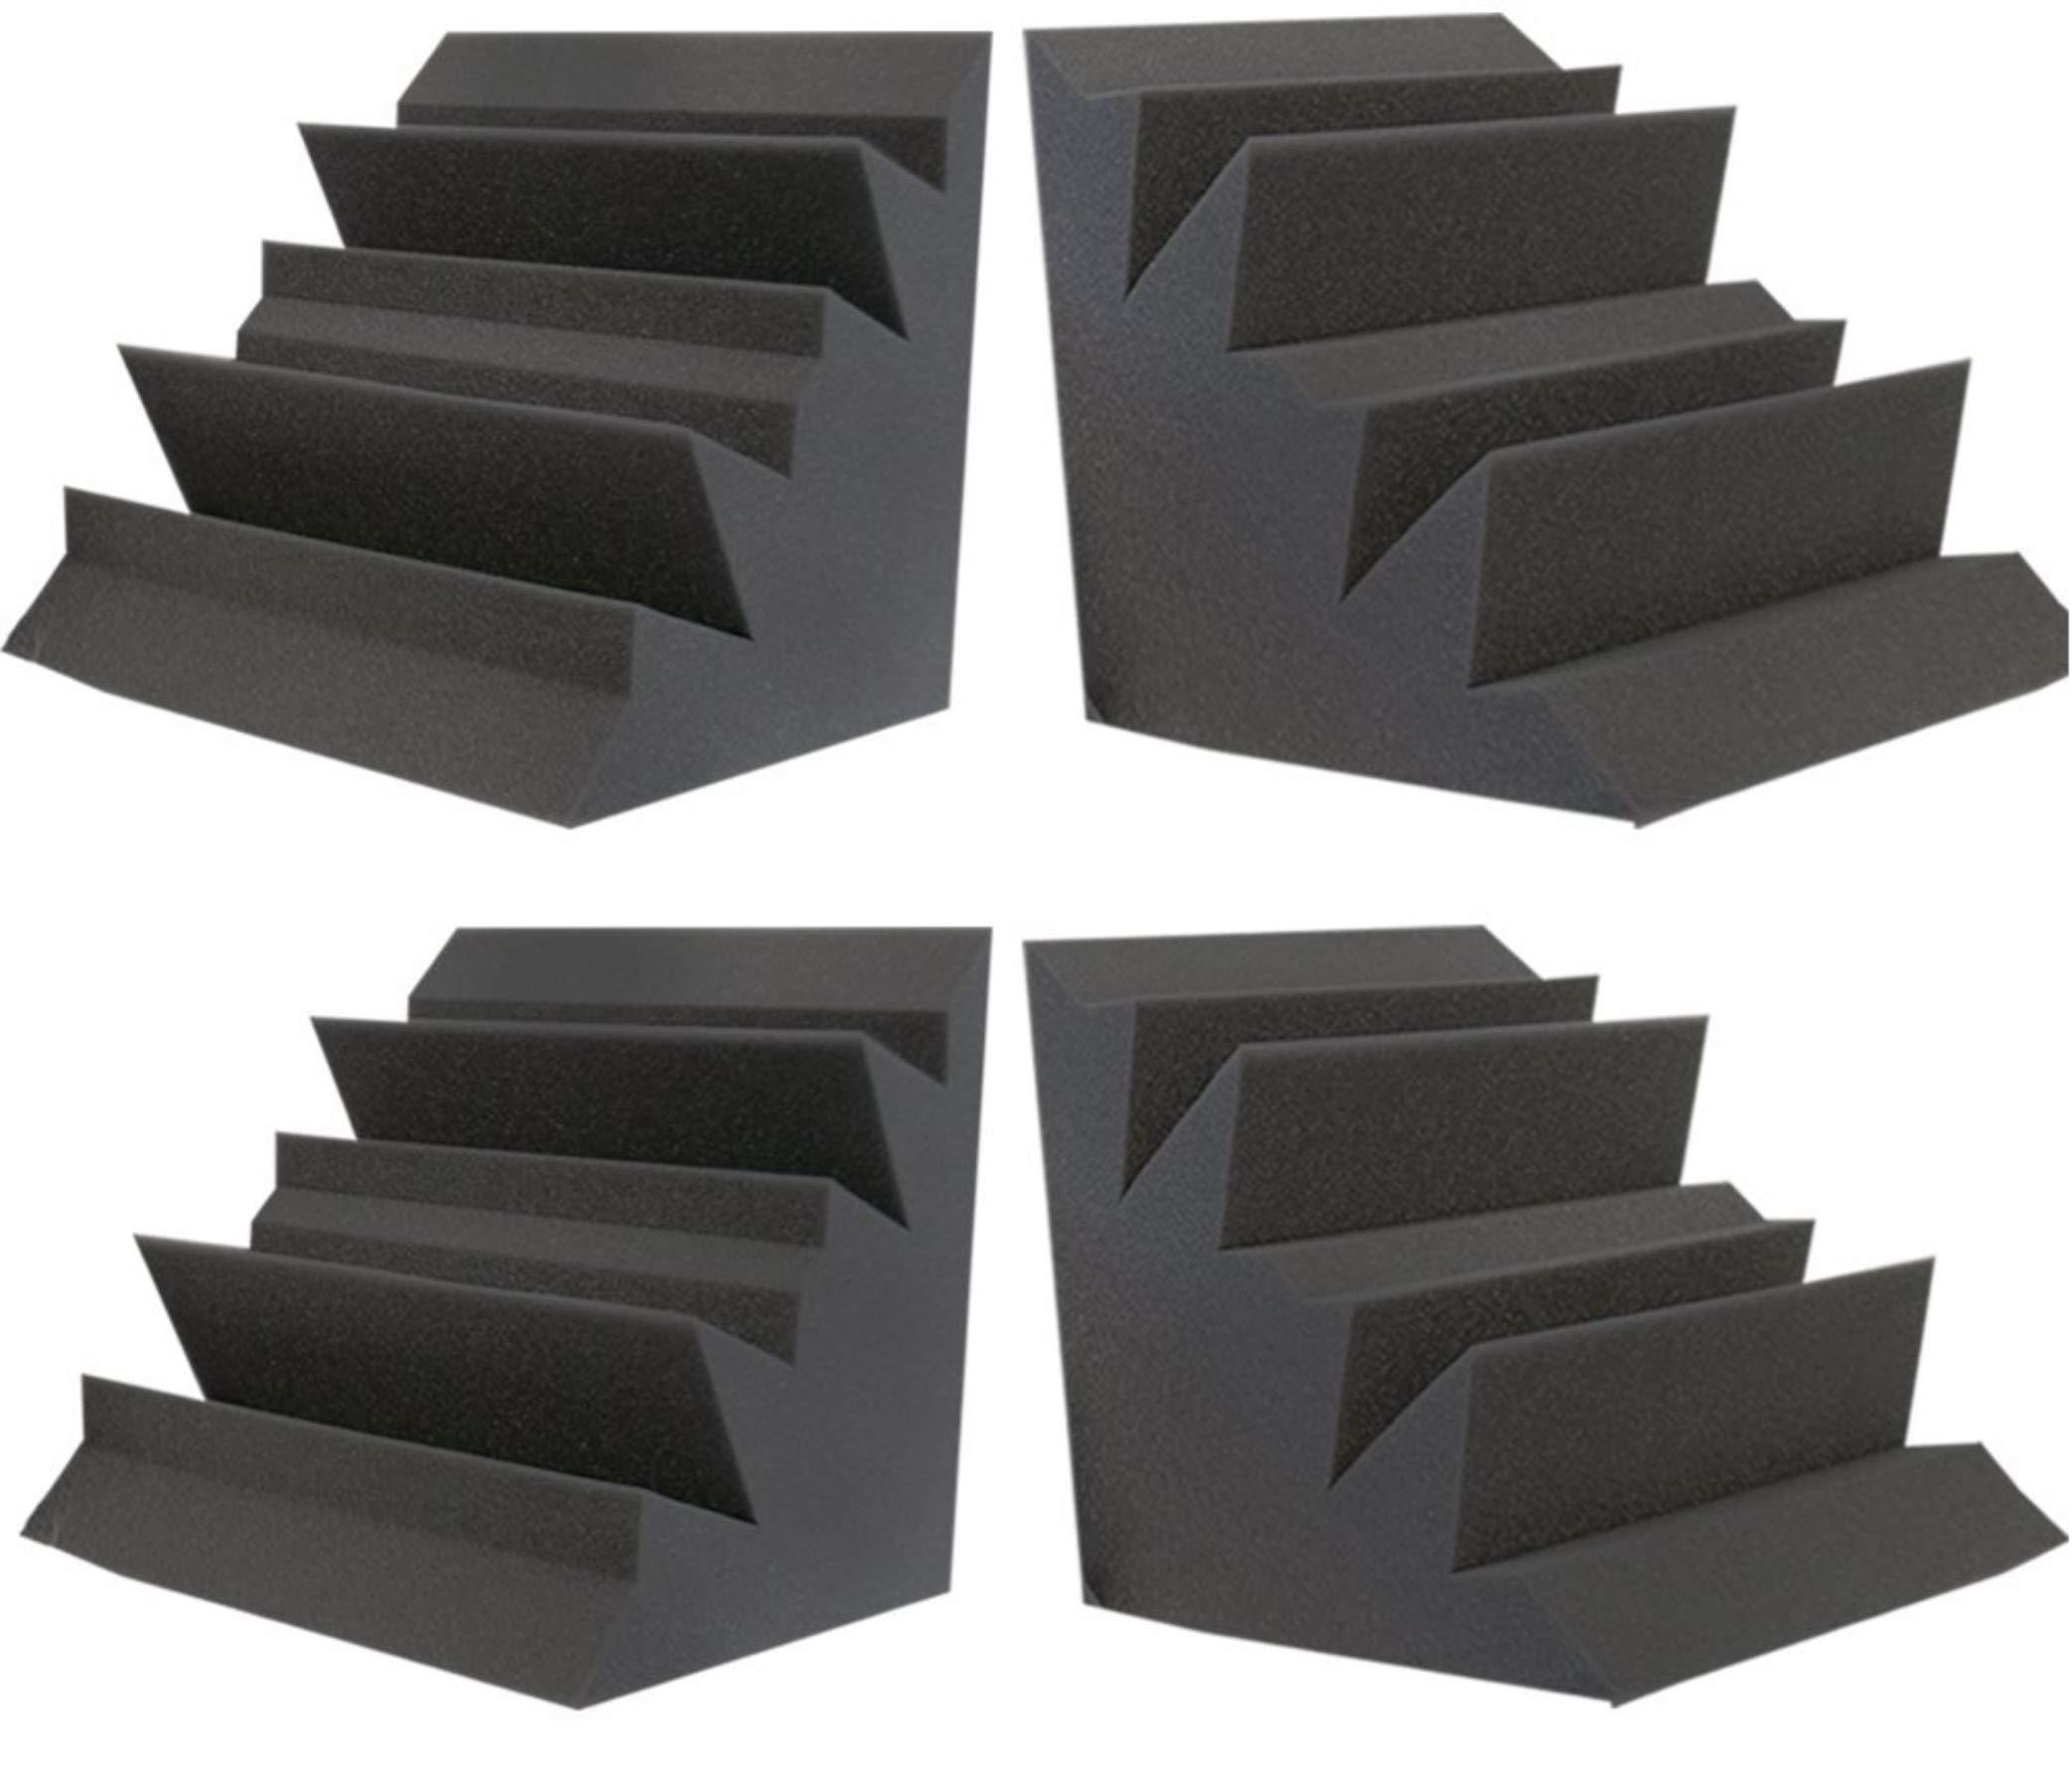 Foamily Acoustic Foam XL Bass Trap Studio Soundproofing Corner Wall 12'' X 12'' X 12'' (4 PACK)